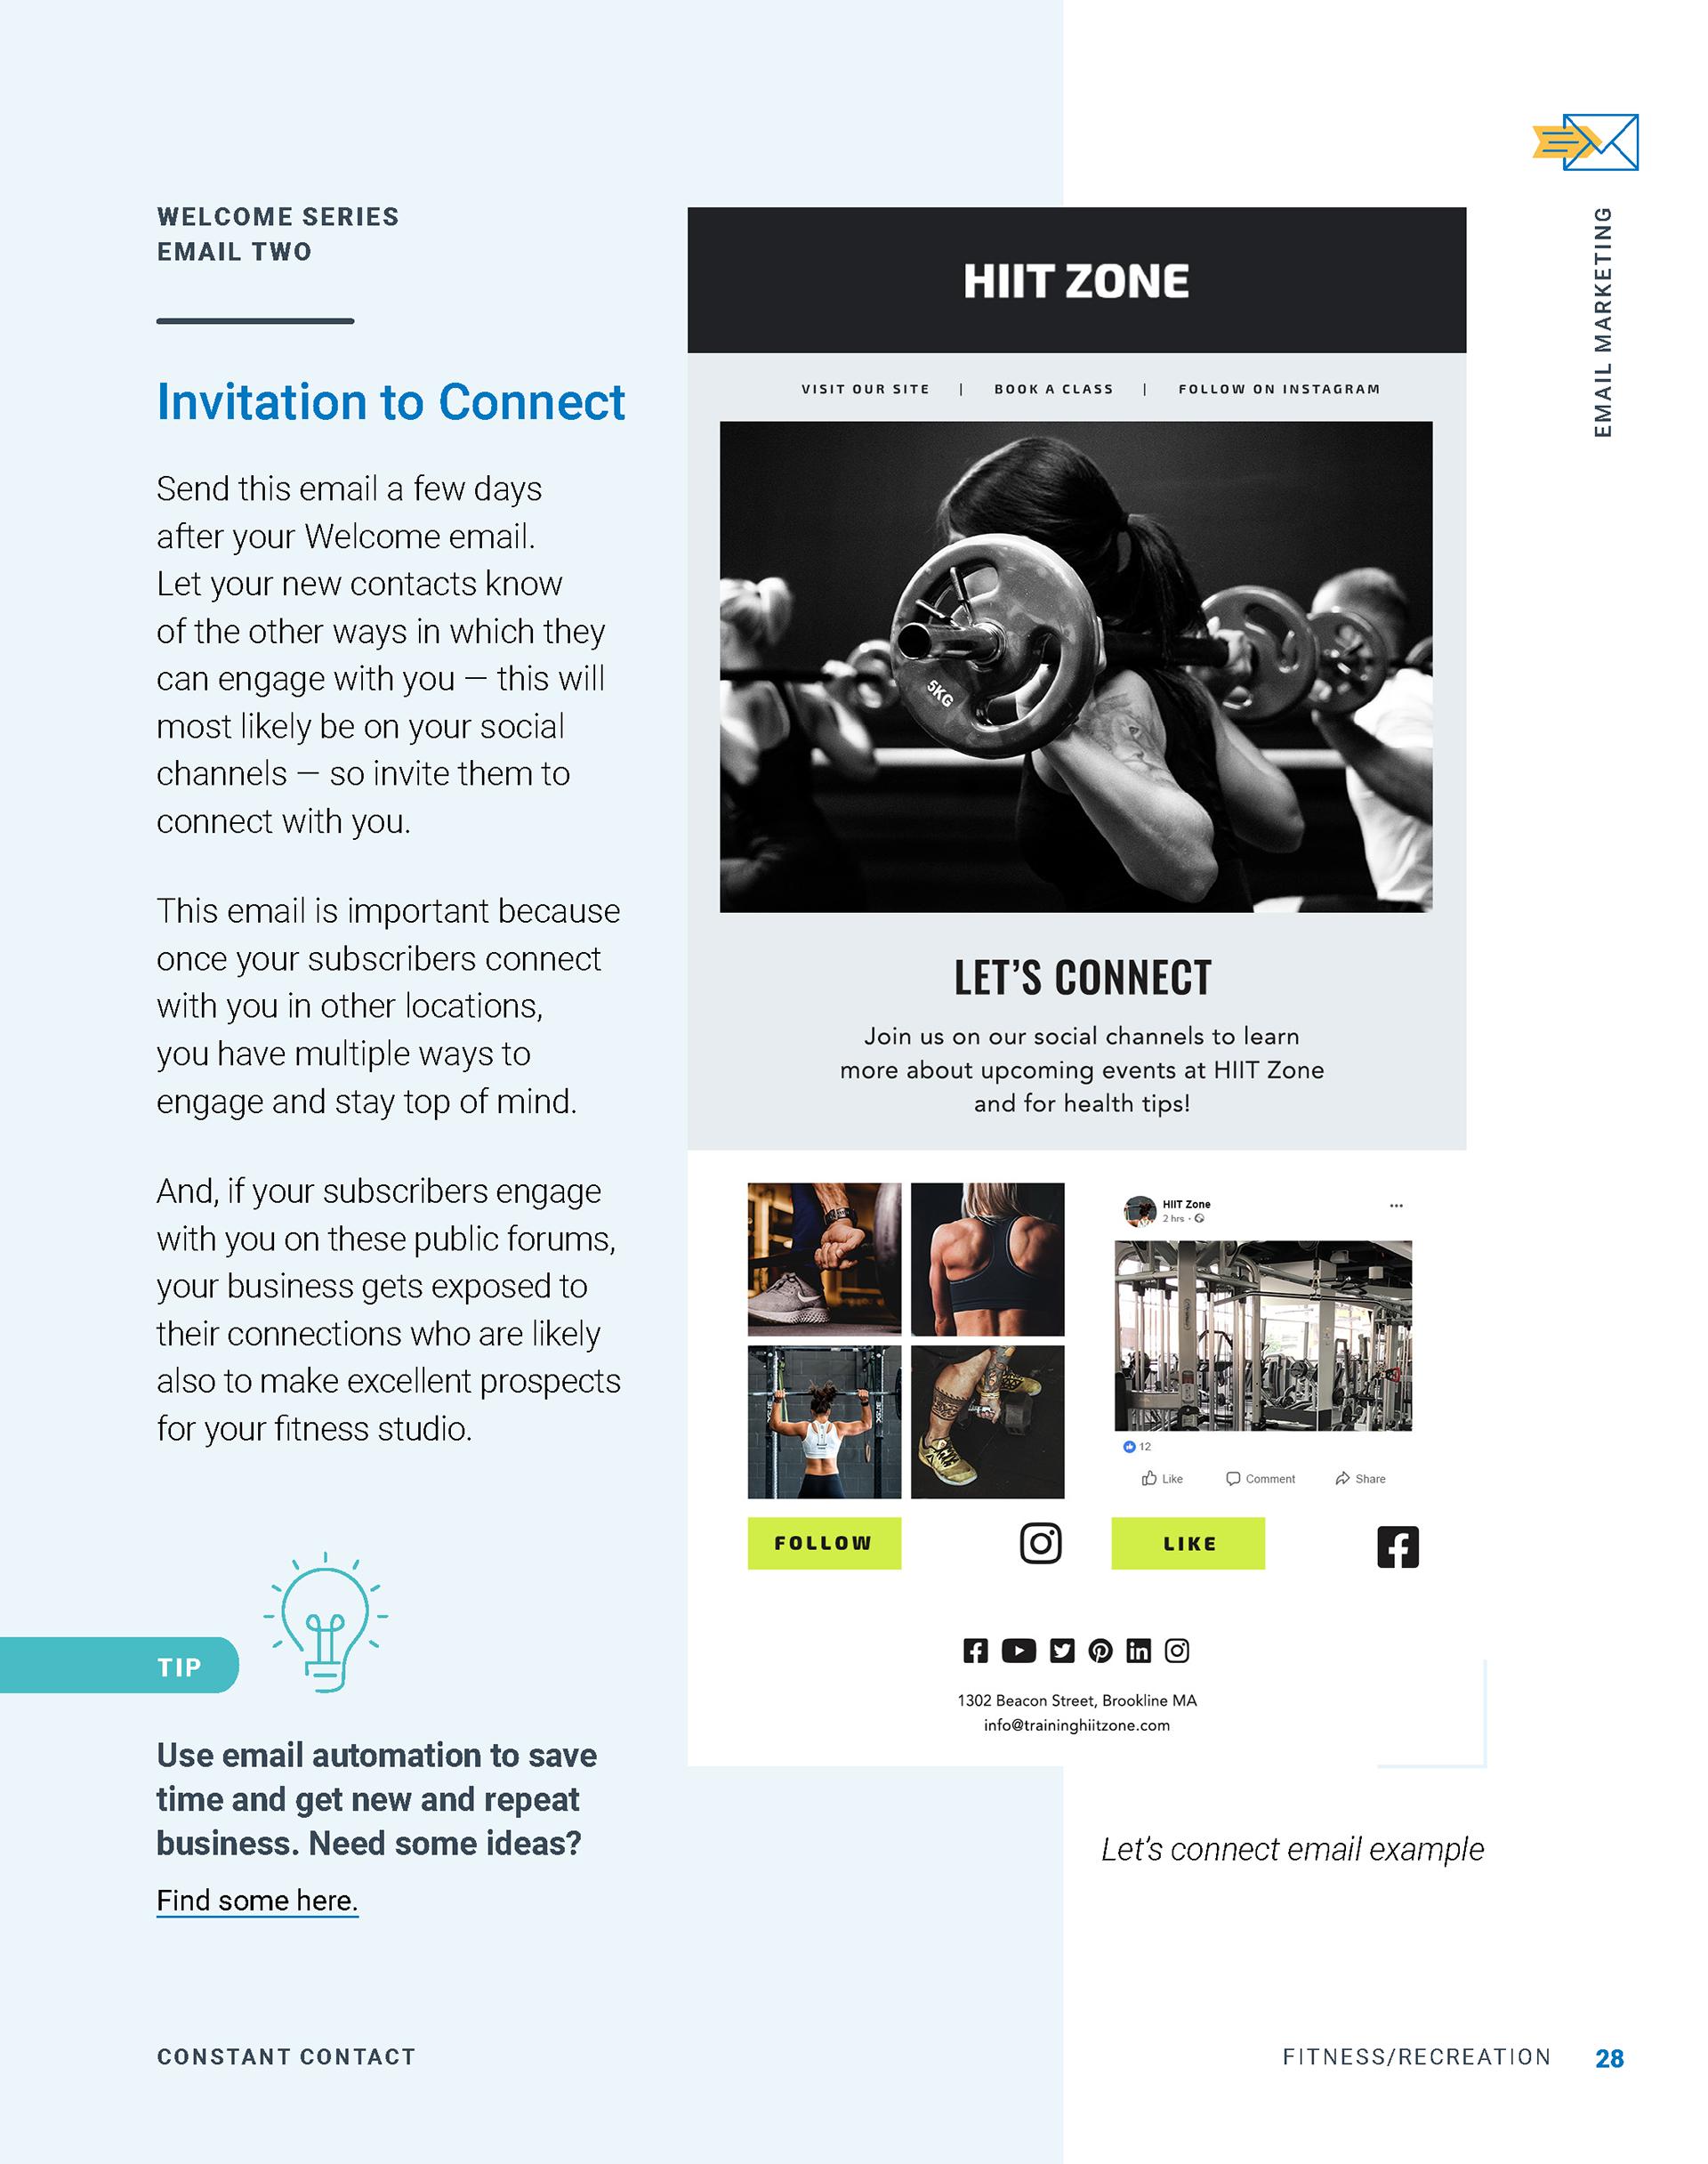 WGI 3-D Media & Marketing - Making Sense of Online ...